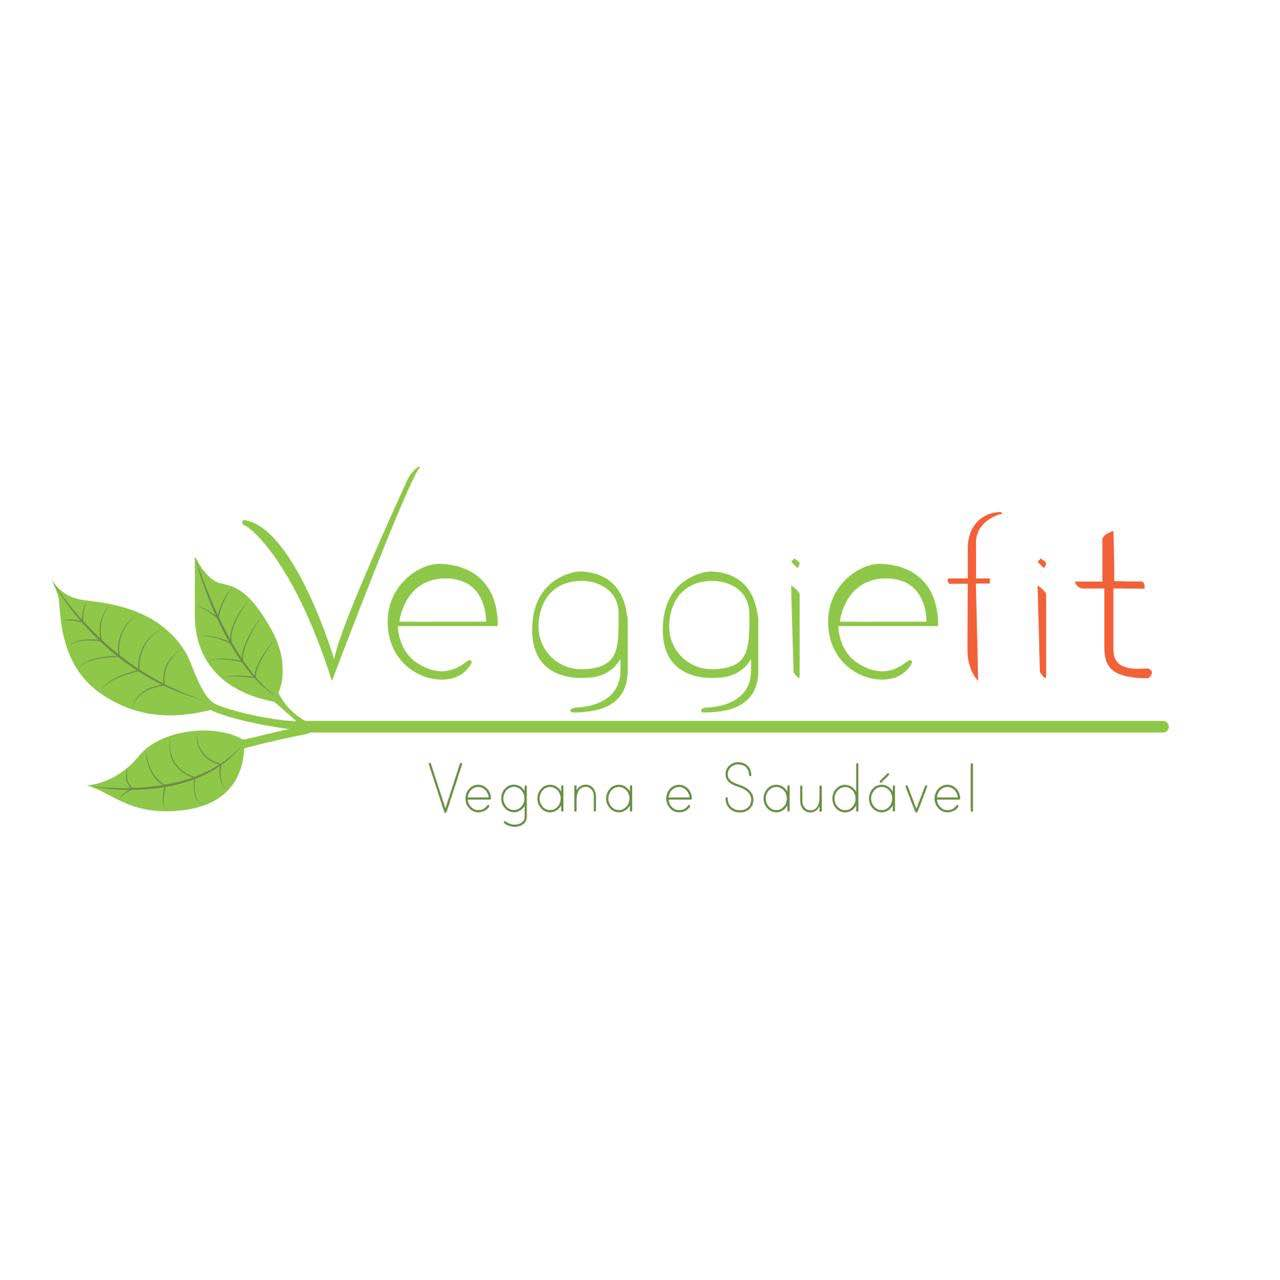 Veggiefit